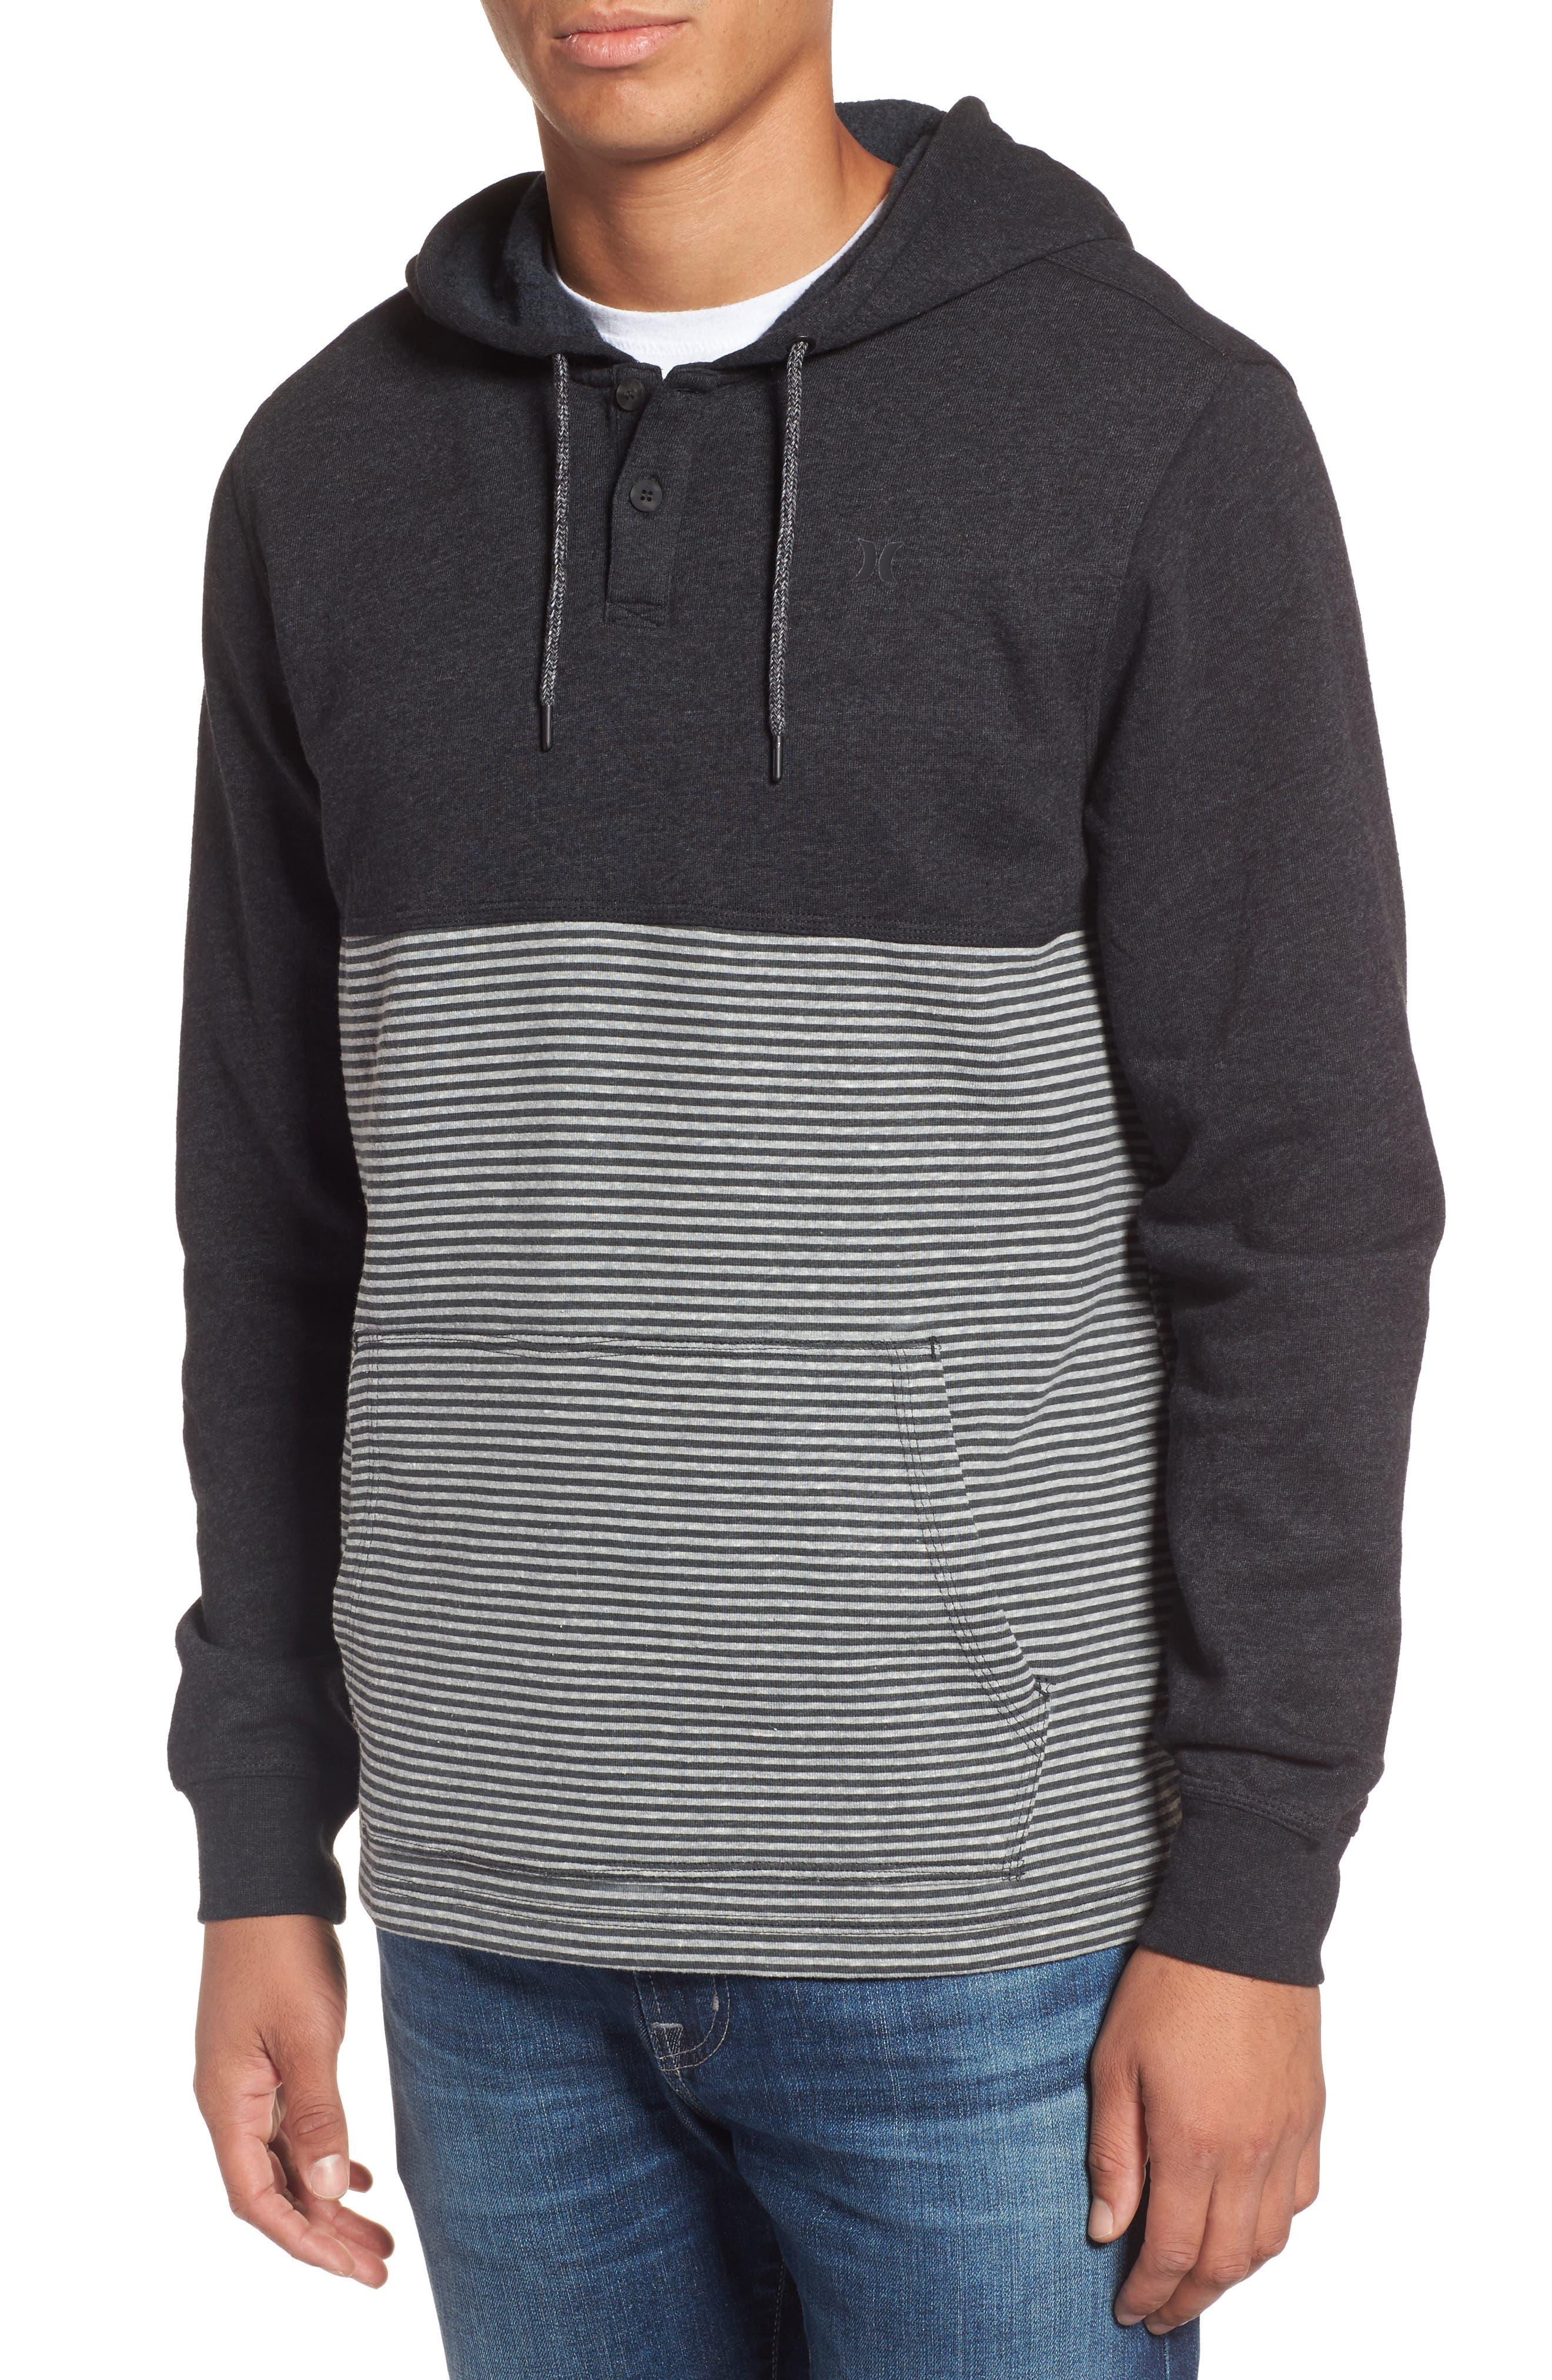 Bayside Pullover Hoodie,                         Main,                         color, Black